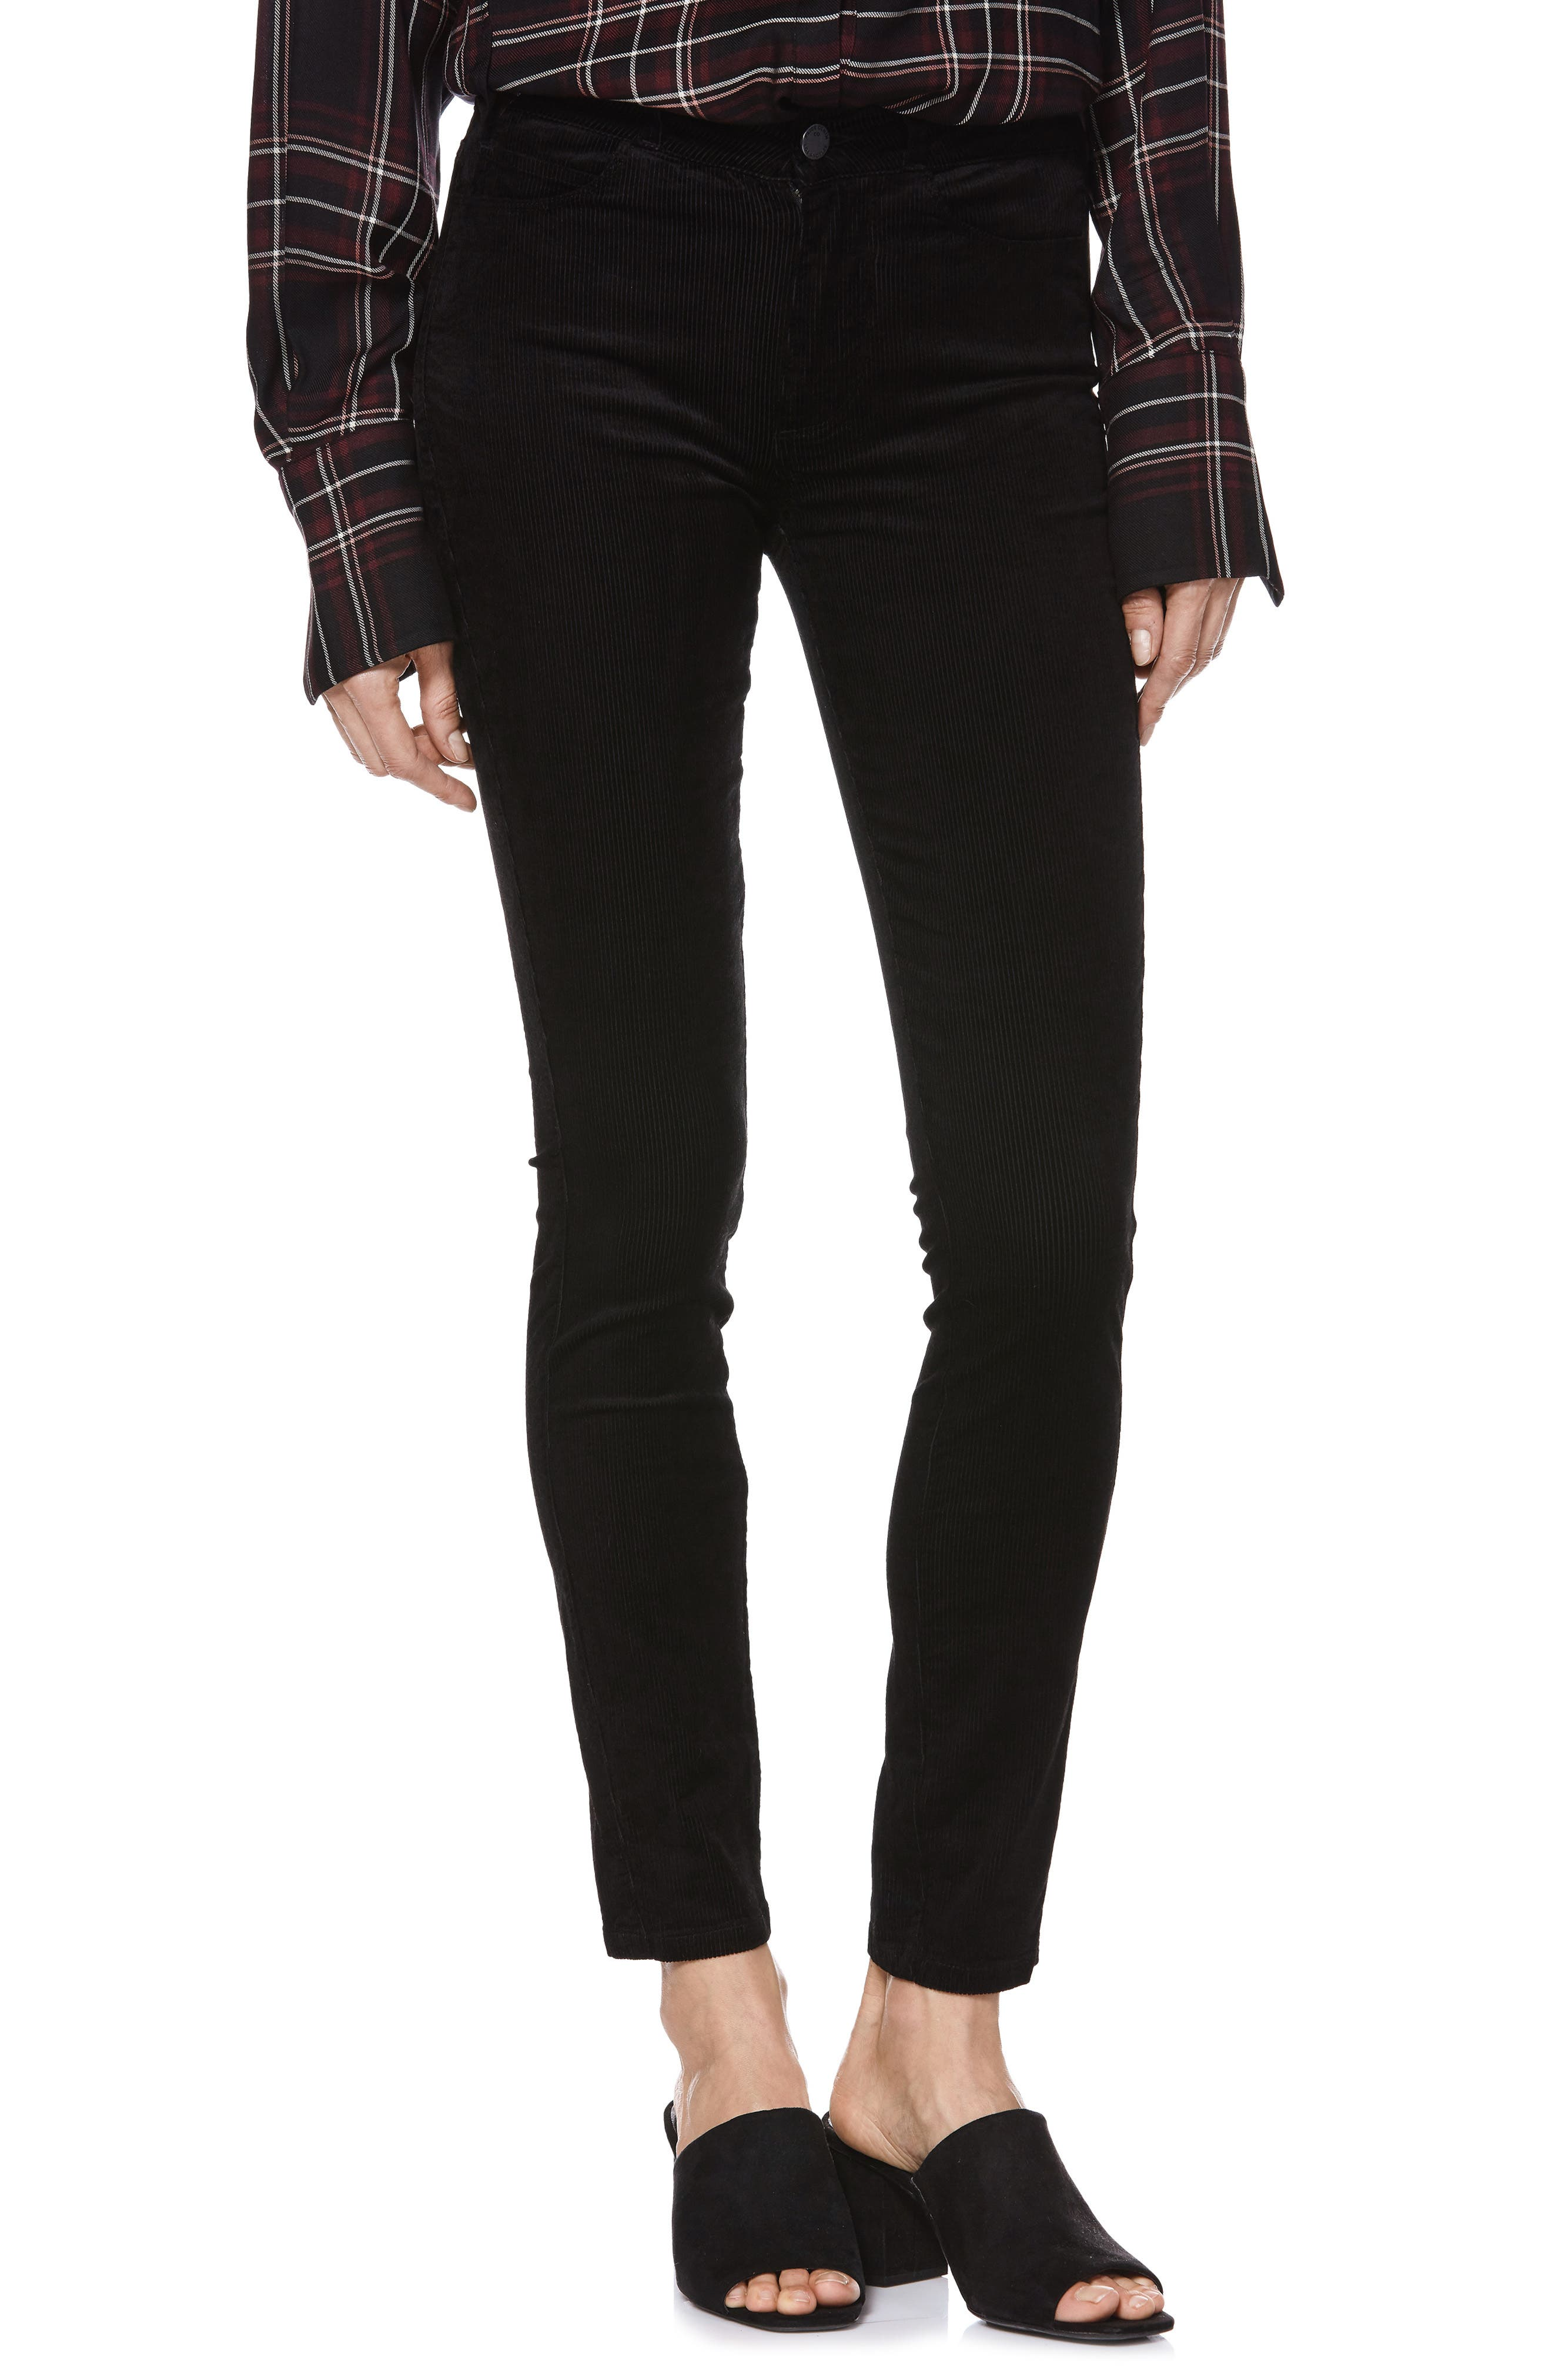 Transcend - Hoxton High Waist Ultra Skinny Jeans,                         Main,                         color, 001